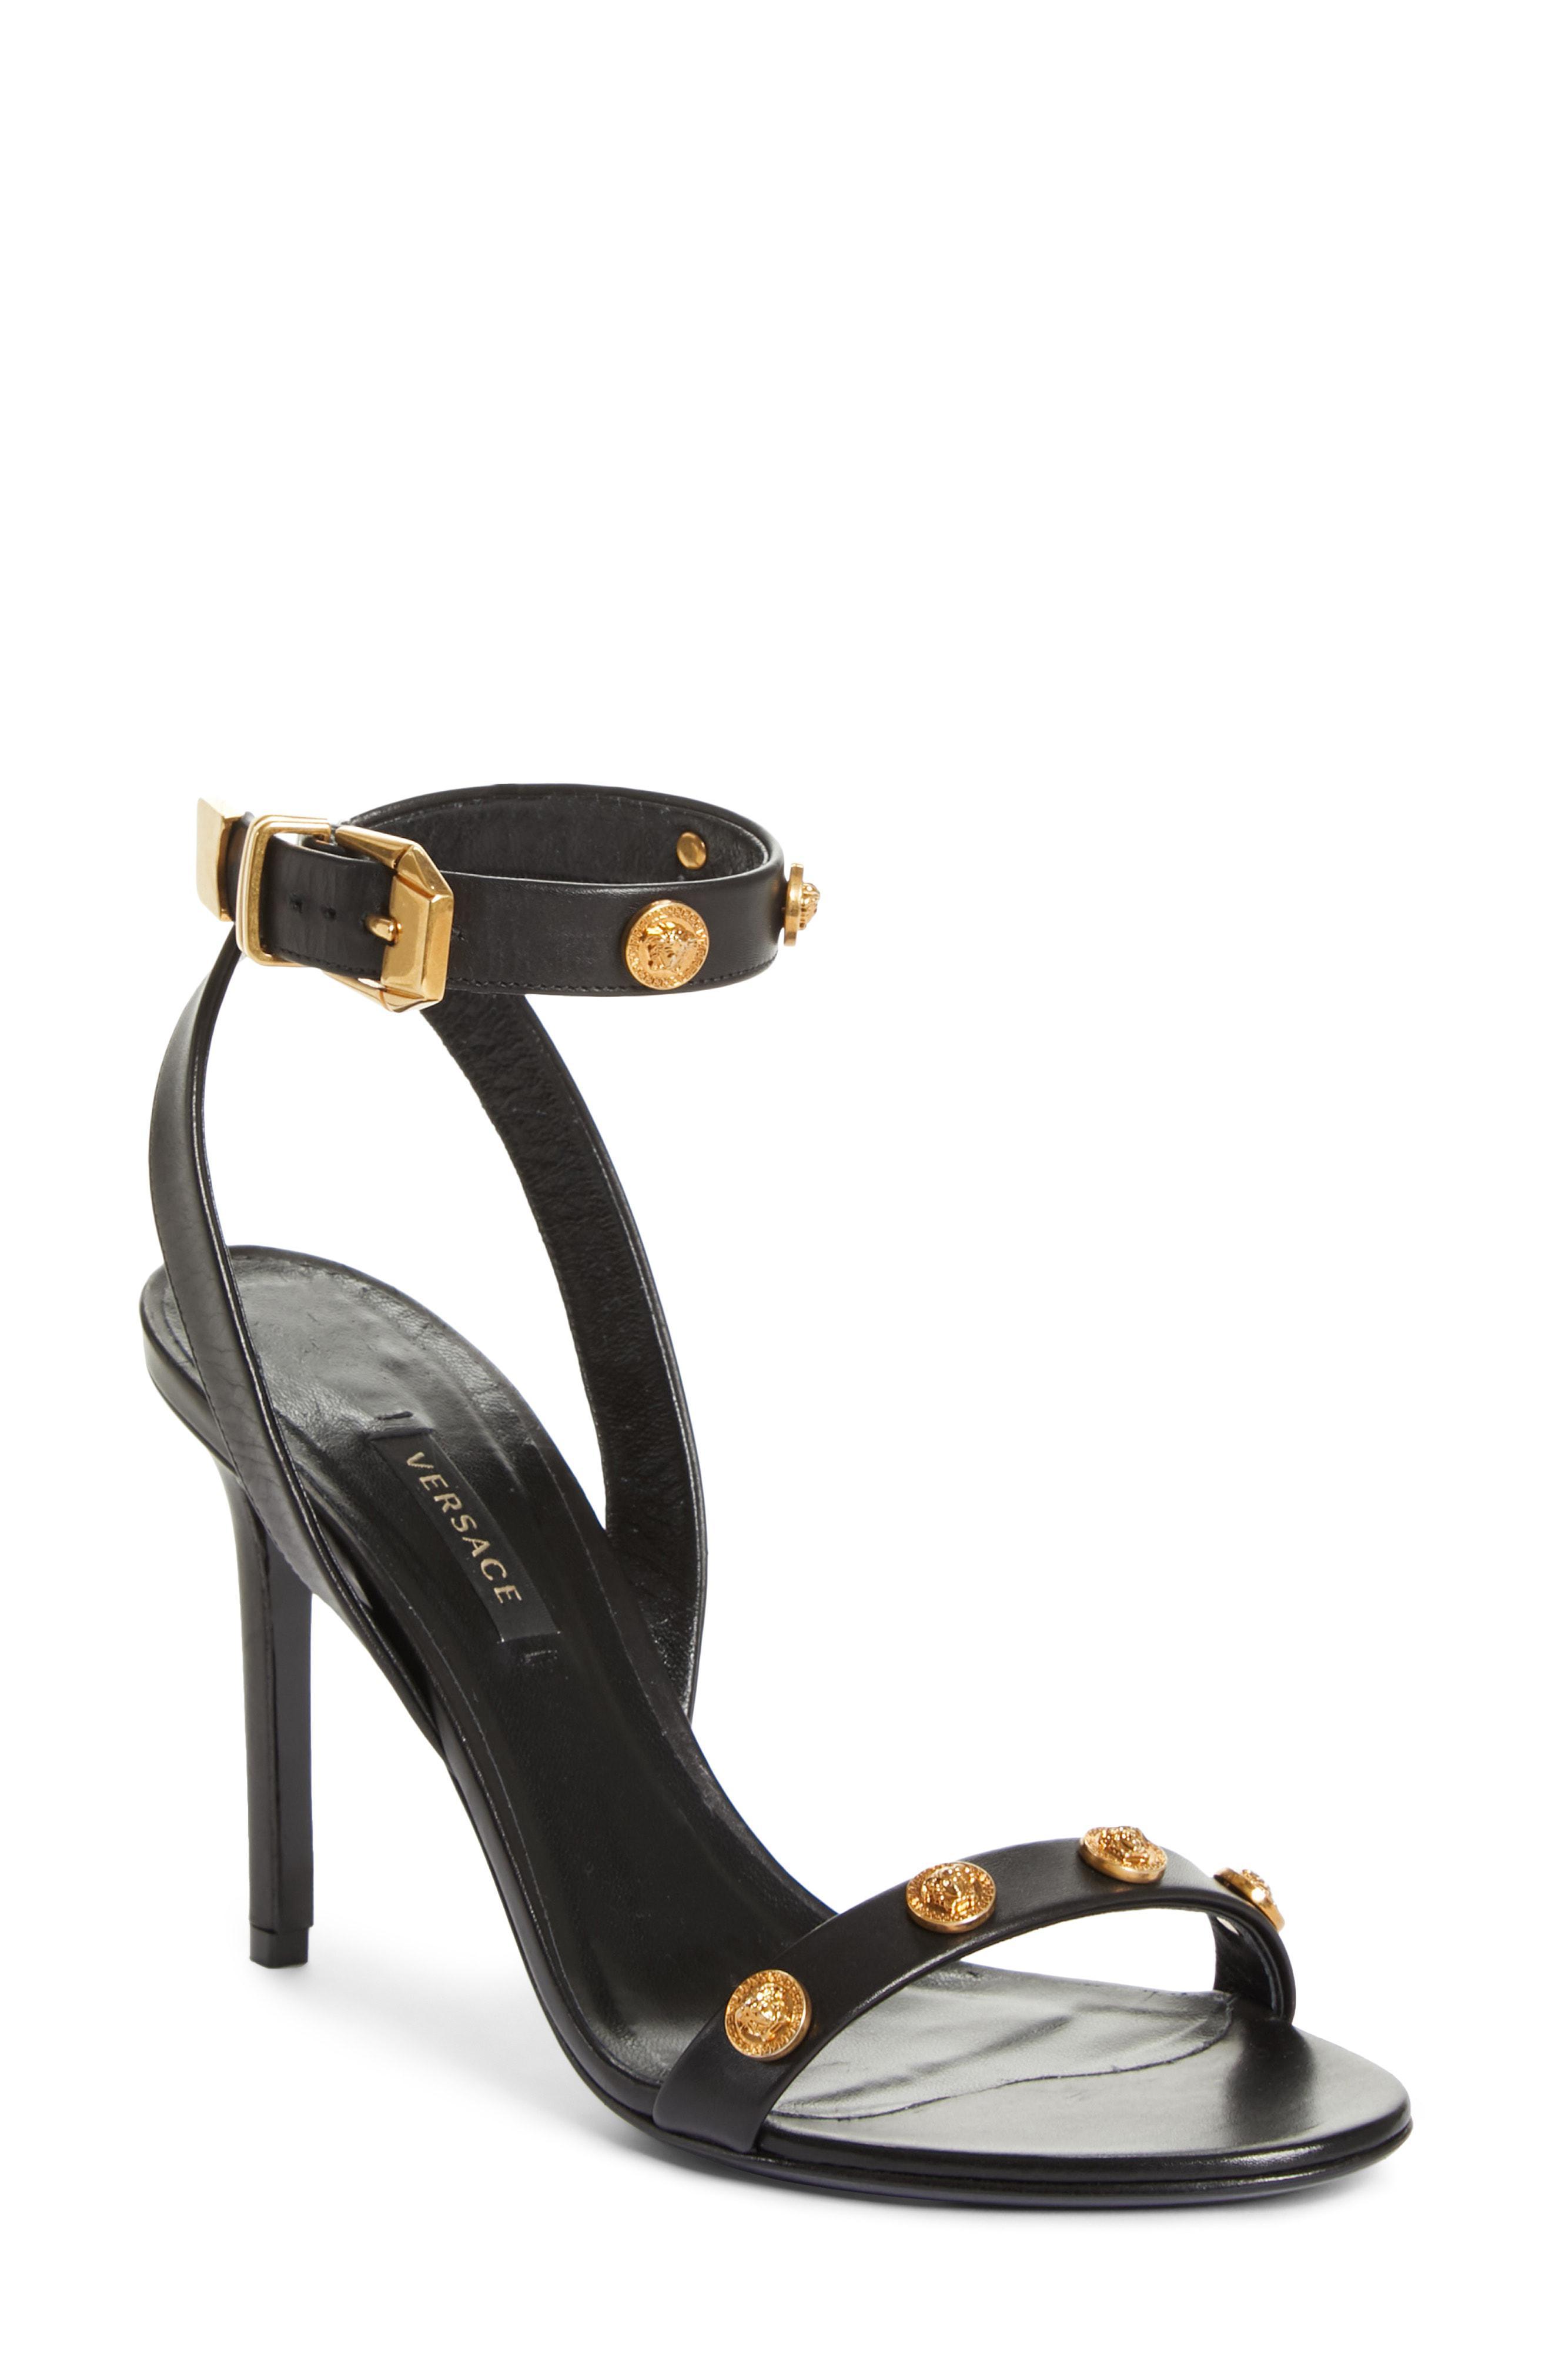 a9c0eb3cc46 Lyst - Versace Tribute Medusa Ankle Strap Sandal in Black